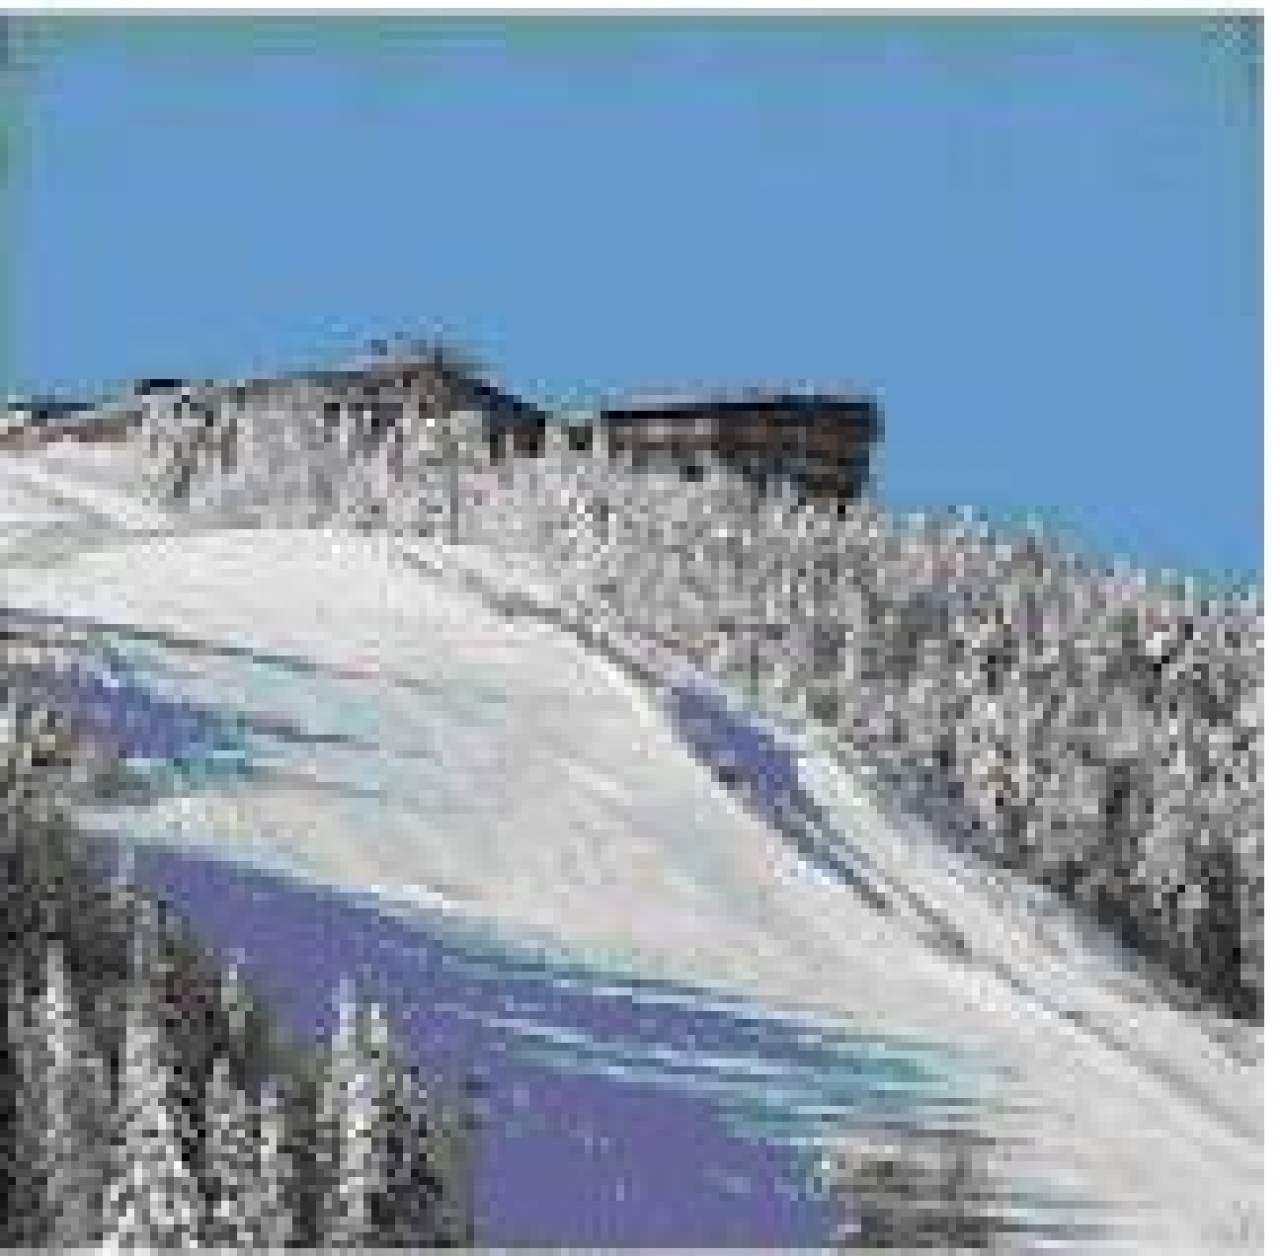 Södra berget slalombacken